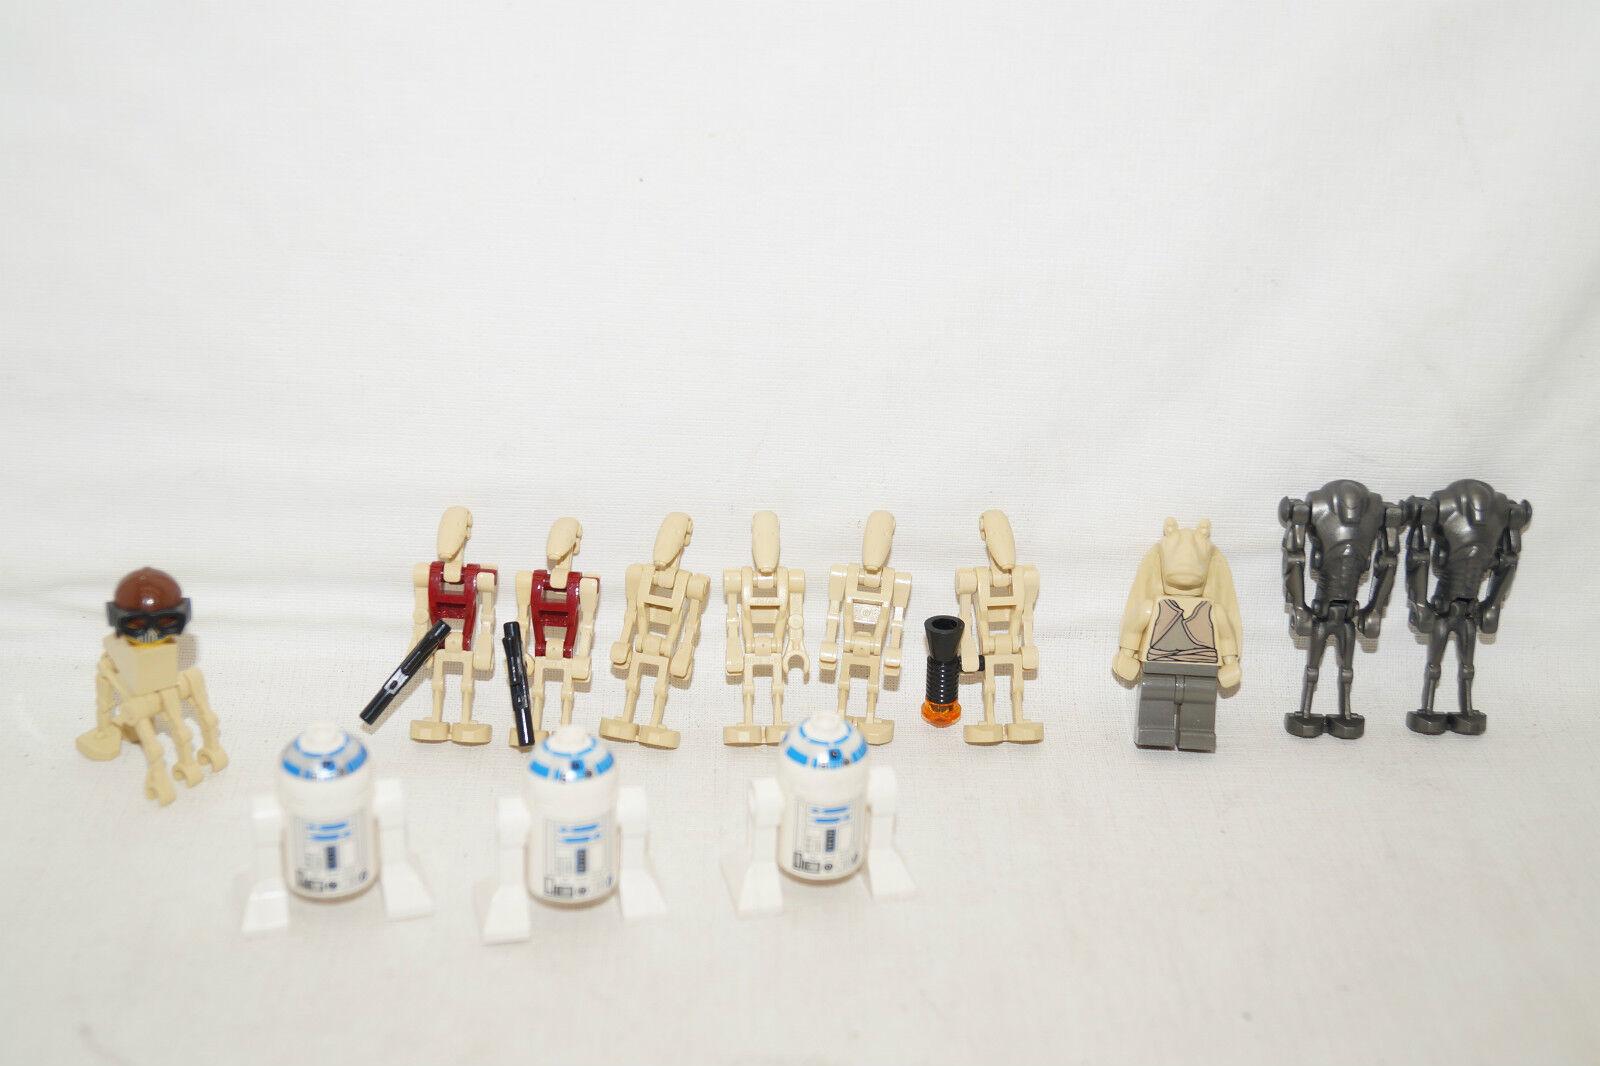 LEGO Star Wars 13 Figuren R2-D2 JAR JAR BINGS super Battel Droids und andere